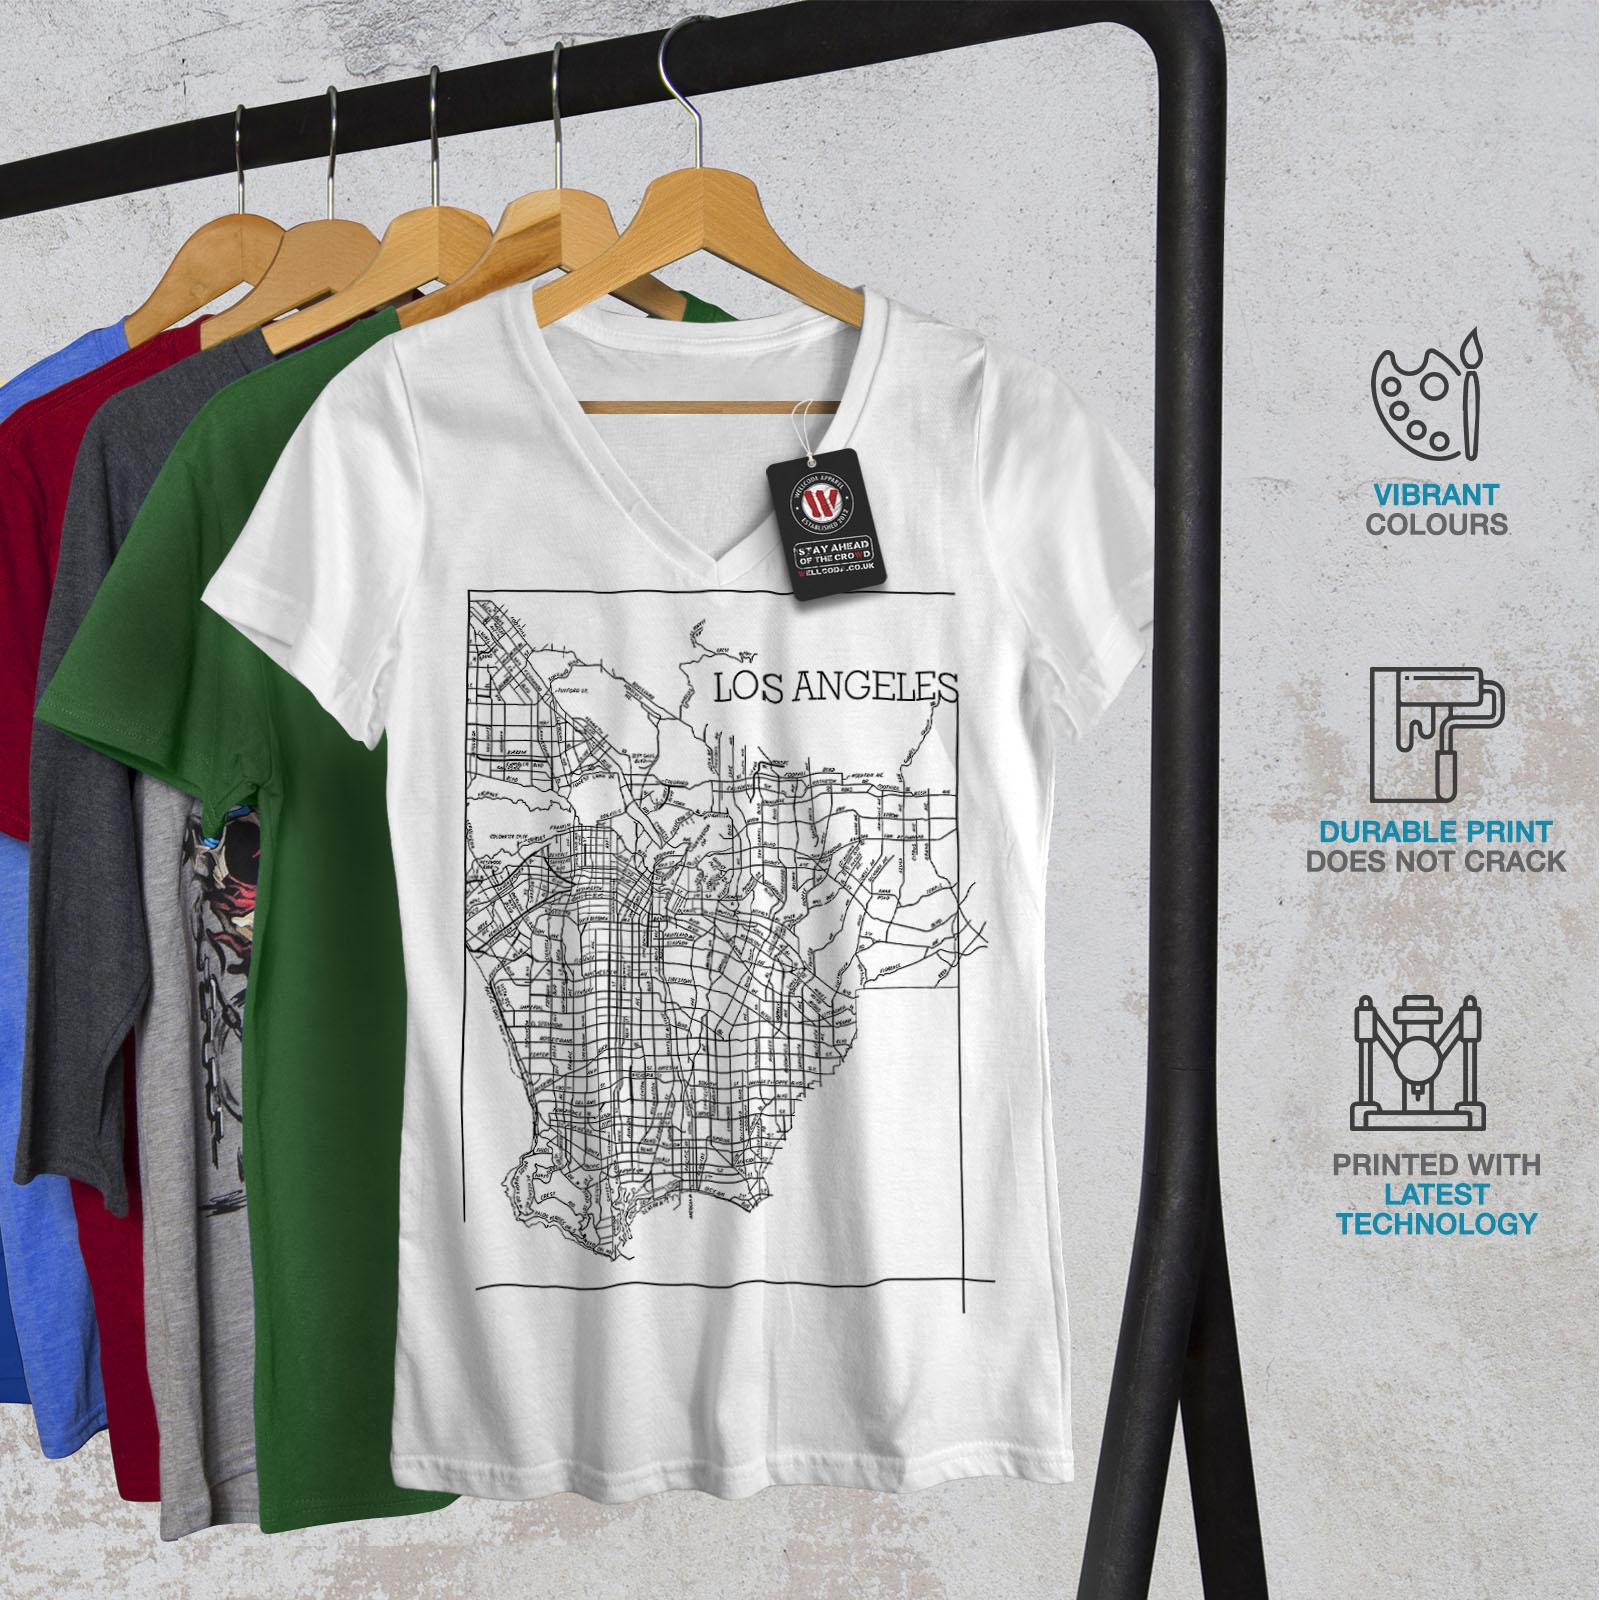 Wellcoda-Los-Angeles-Map-Fashion-Womens-V-Neck-T-shirt-Town-Graphic-Design-Tee thumbnail 8